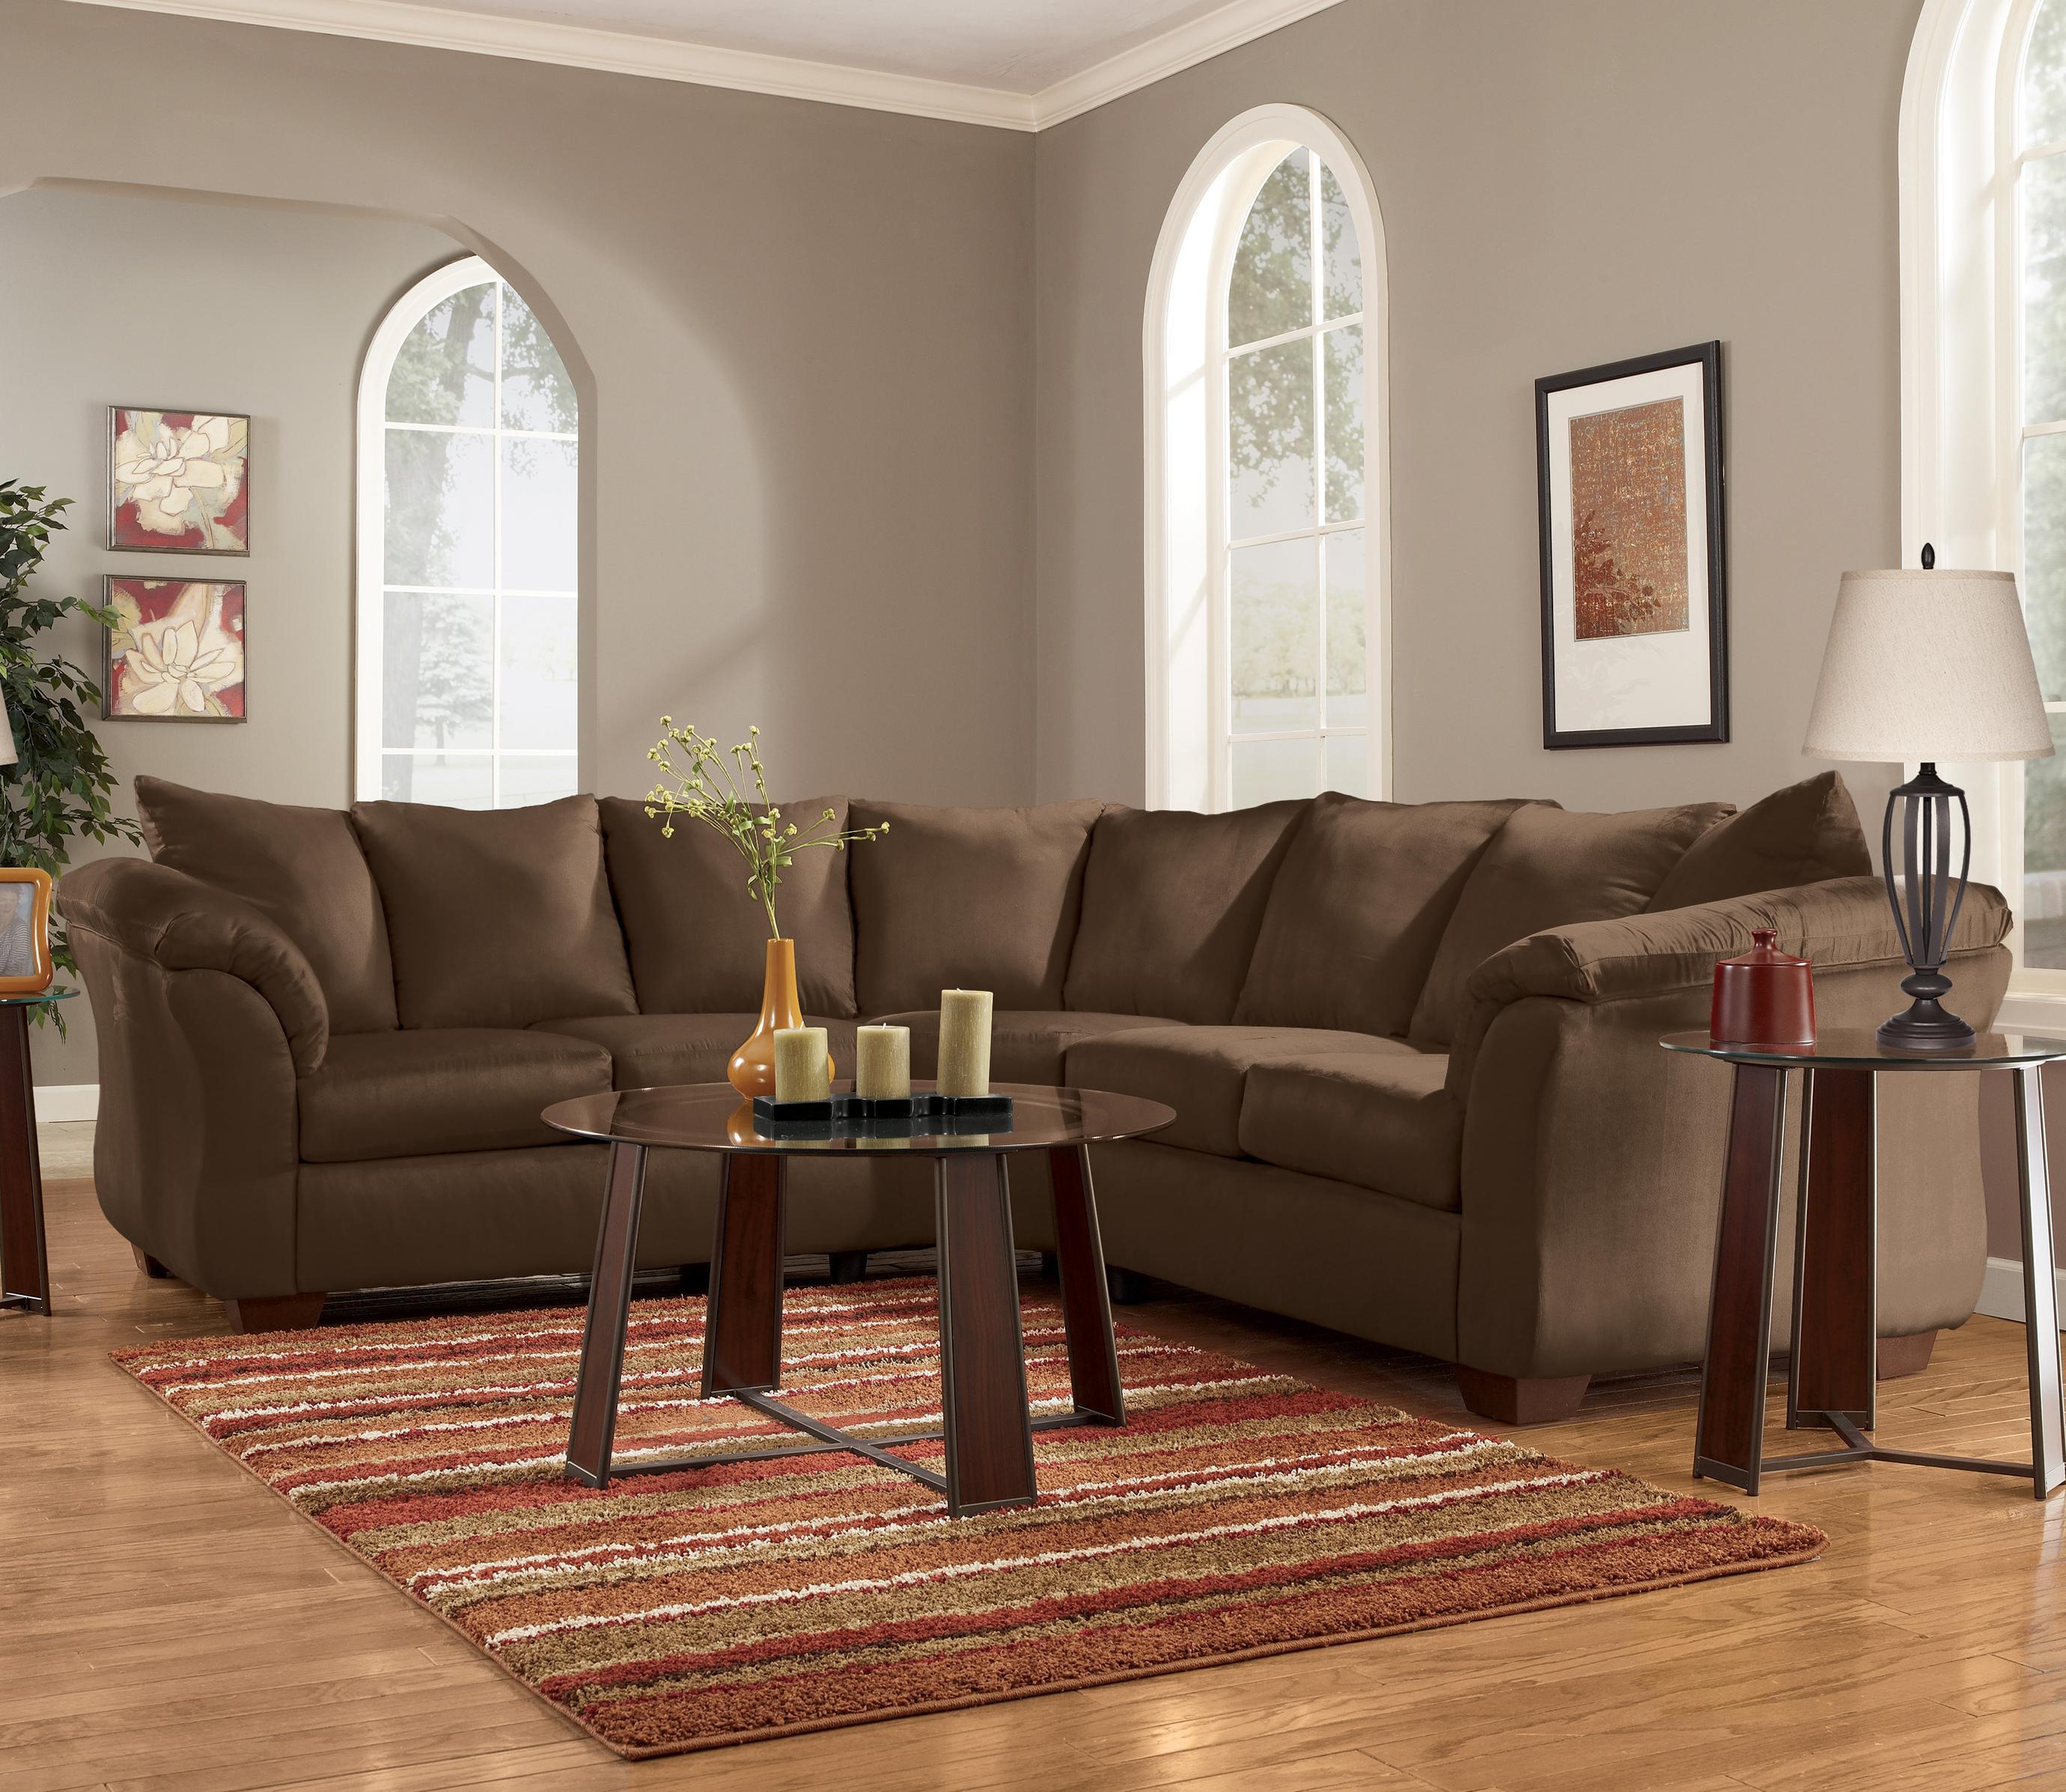 Ashley Furniture In North Carolina